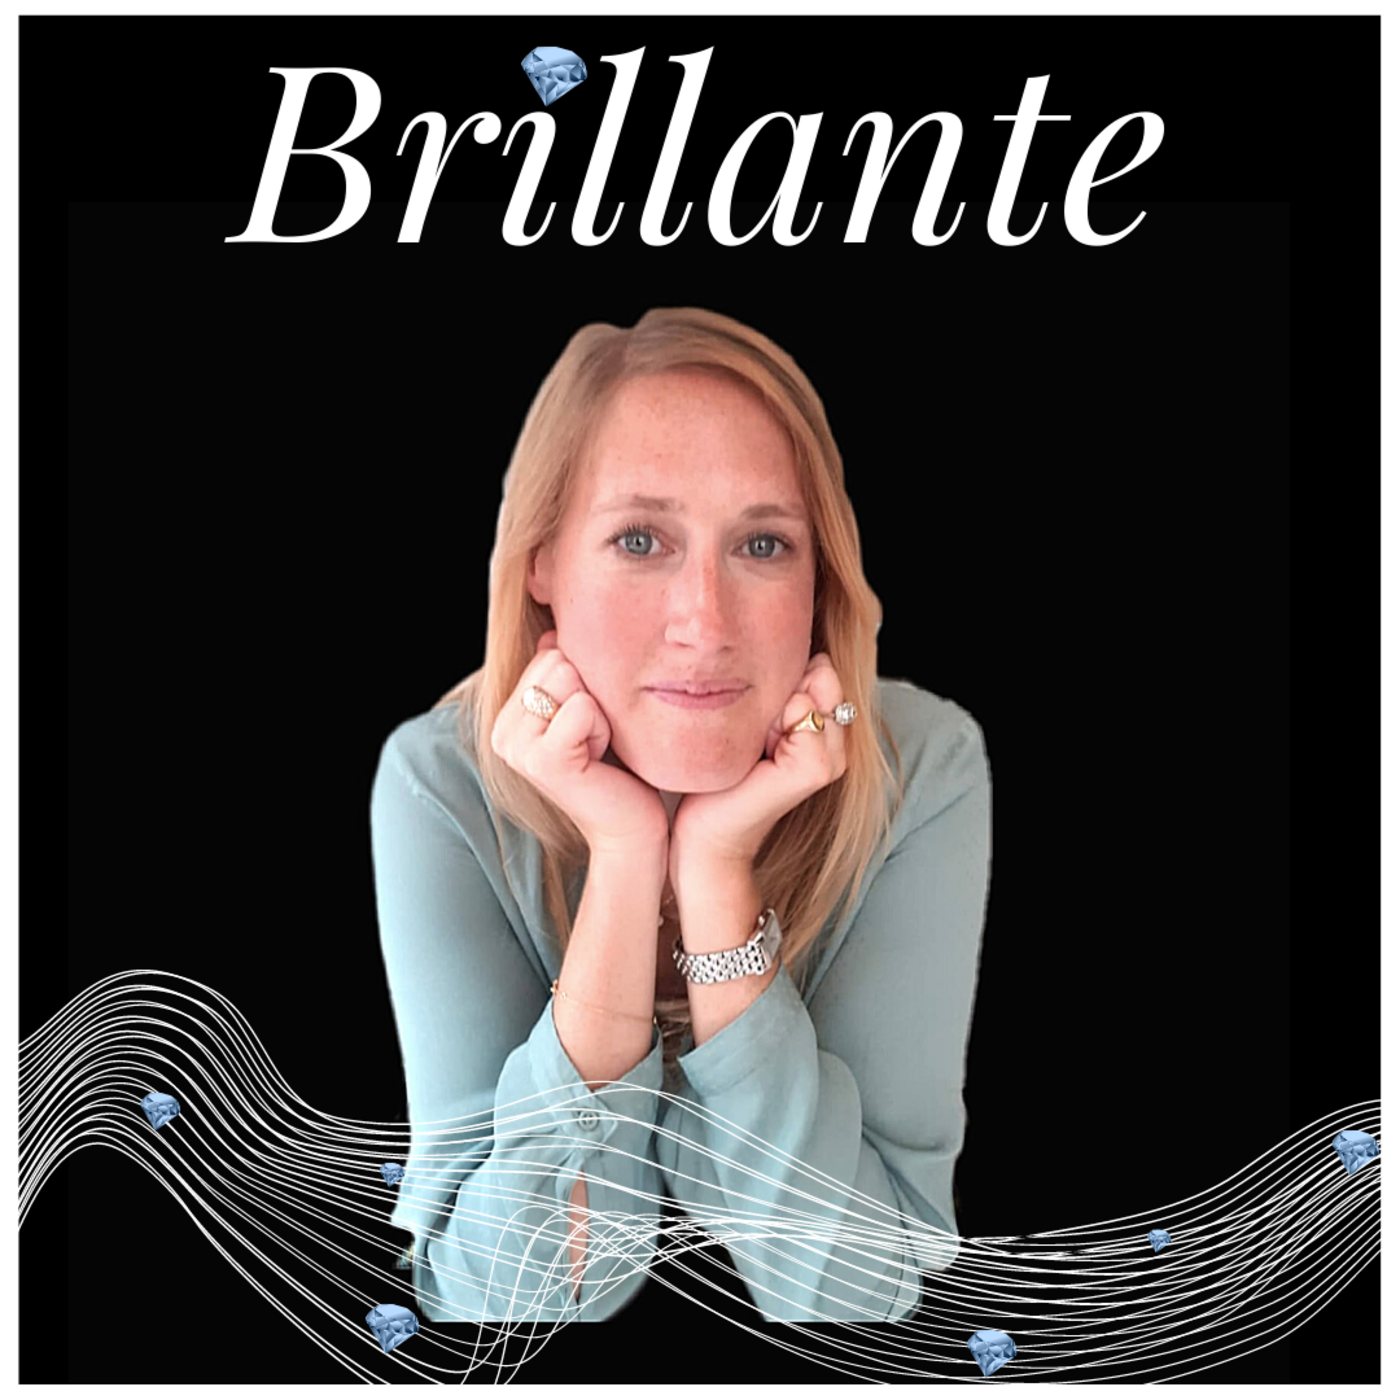 Brillante #2 Violaine d'Astorg - Head of Jewellery department Christie's